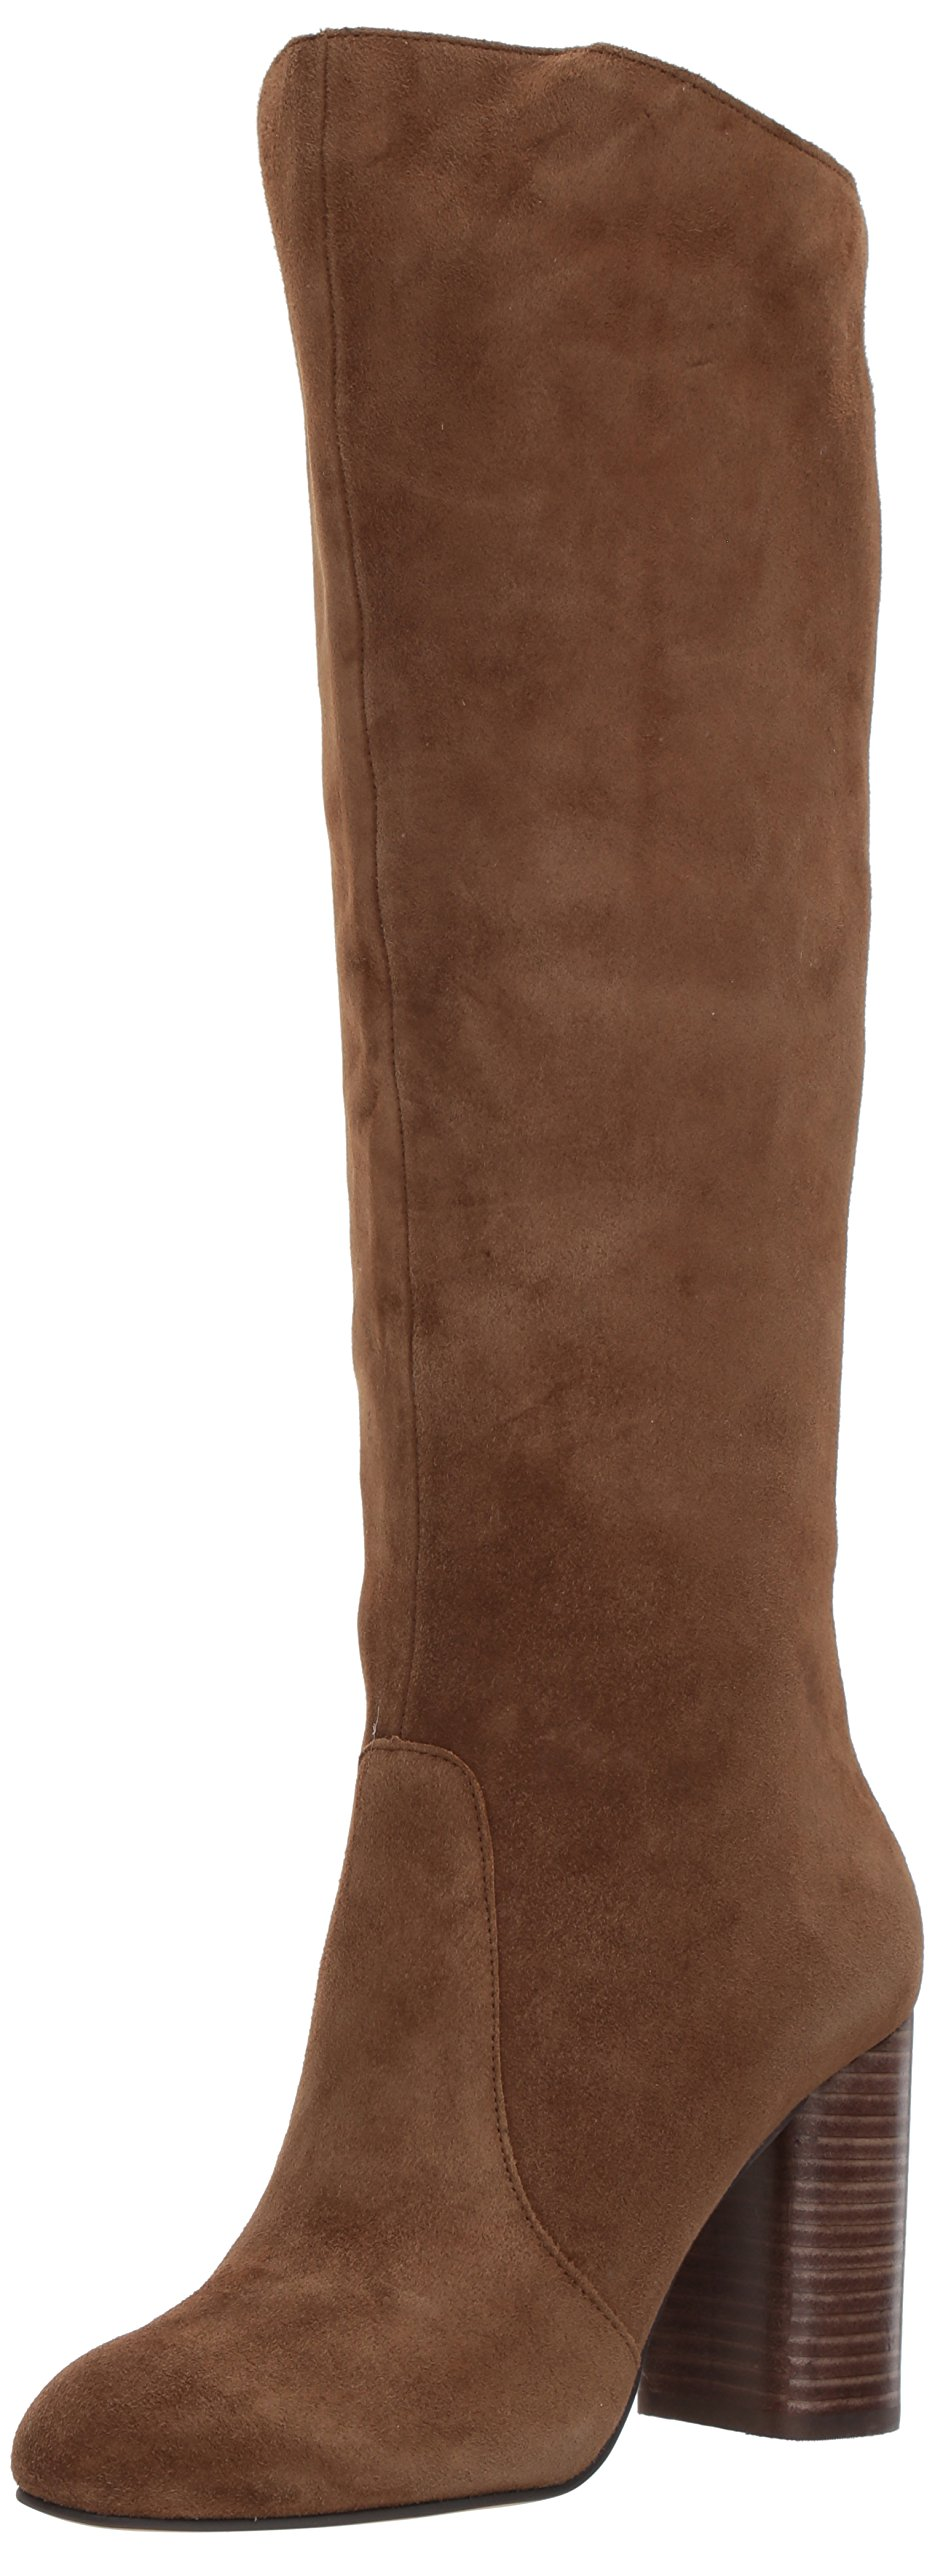 Dolce Vita Women's Rhea Fashion Boot, Brown Suede, 7.5 Medium US